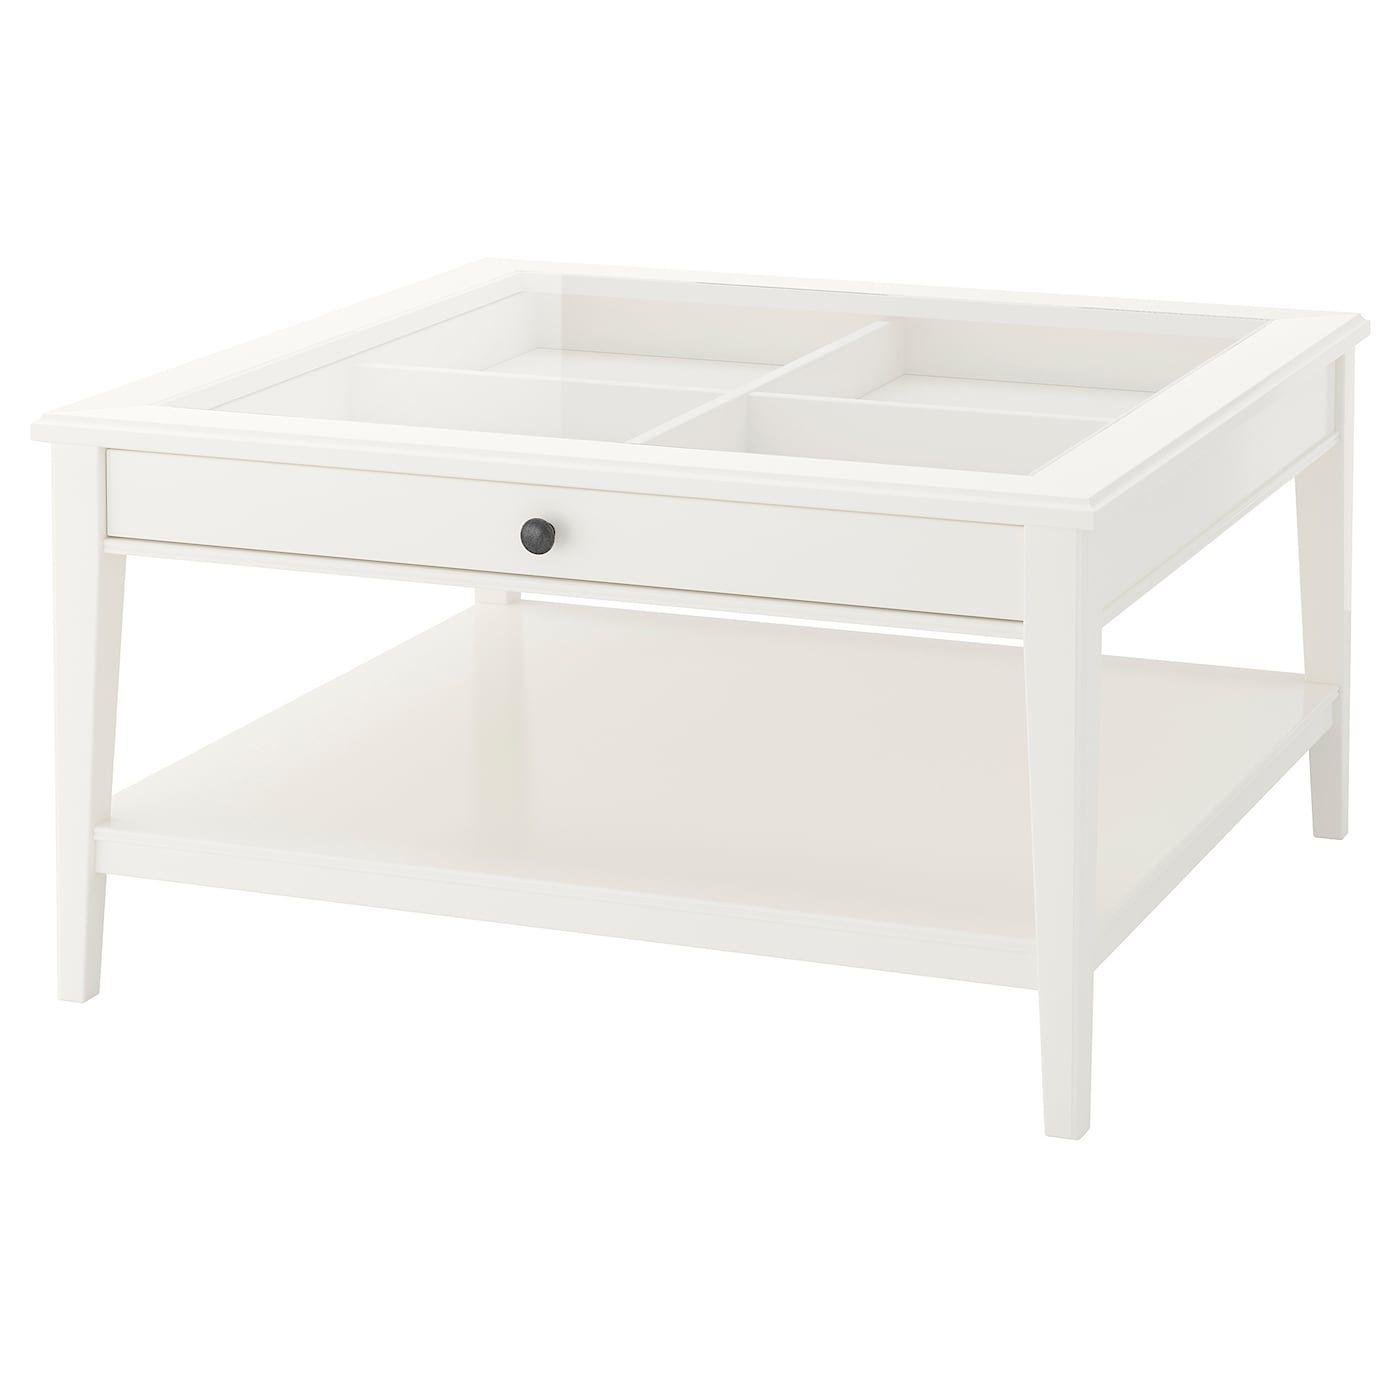 Liatorp Table Basse Blanc Verre 93x93 Cm Ikea Coffee Table White Liatorp Ikea Lack Coffee Table